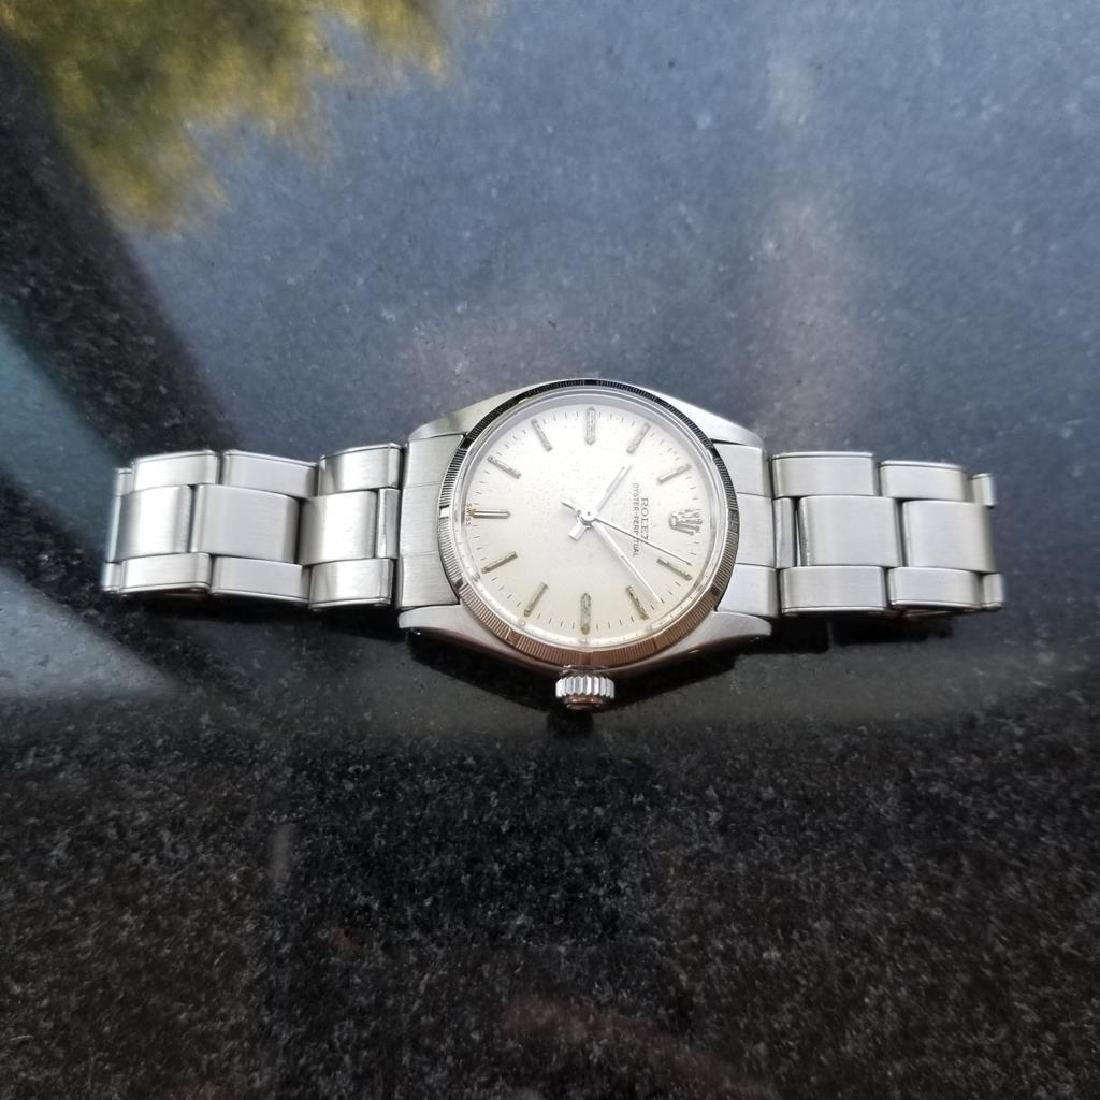 ROLEX Men's Midsize Rolex Oyster Perpetual 6549 - 5